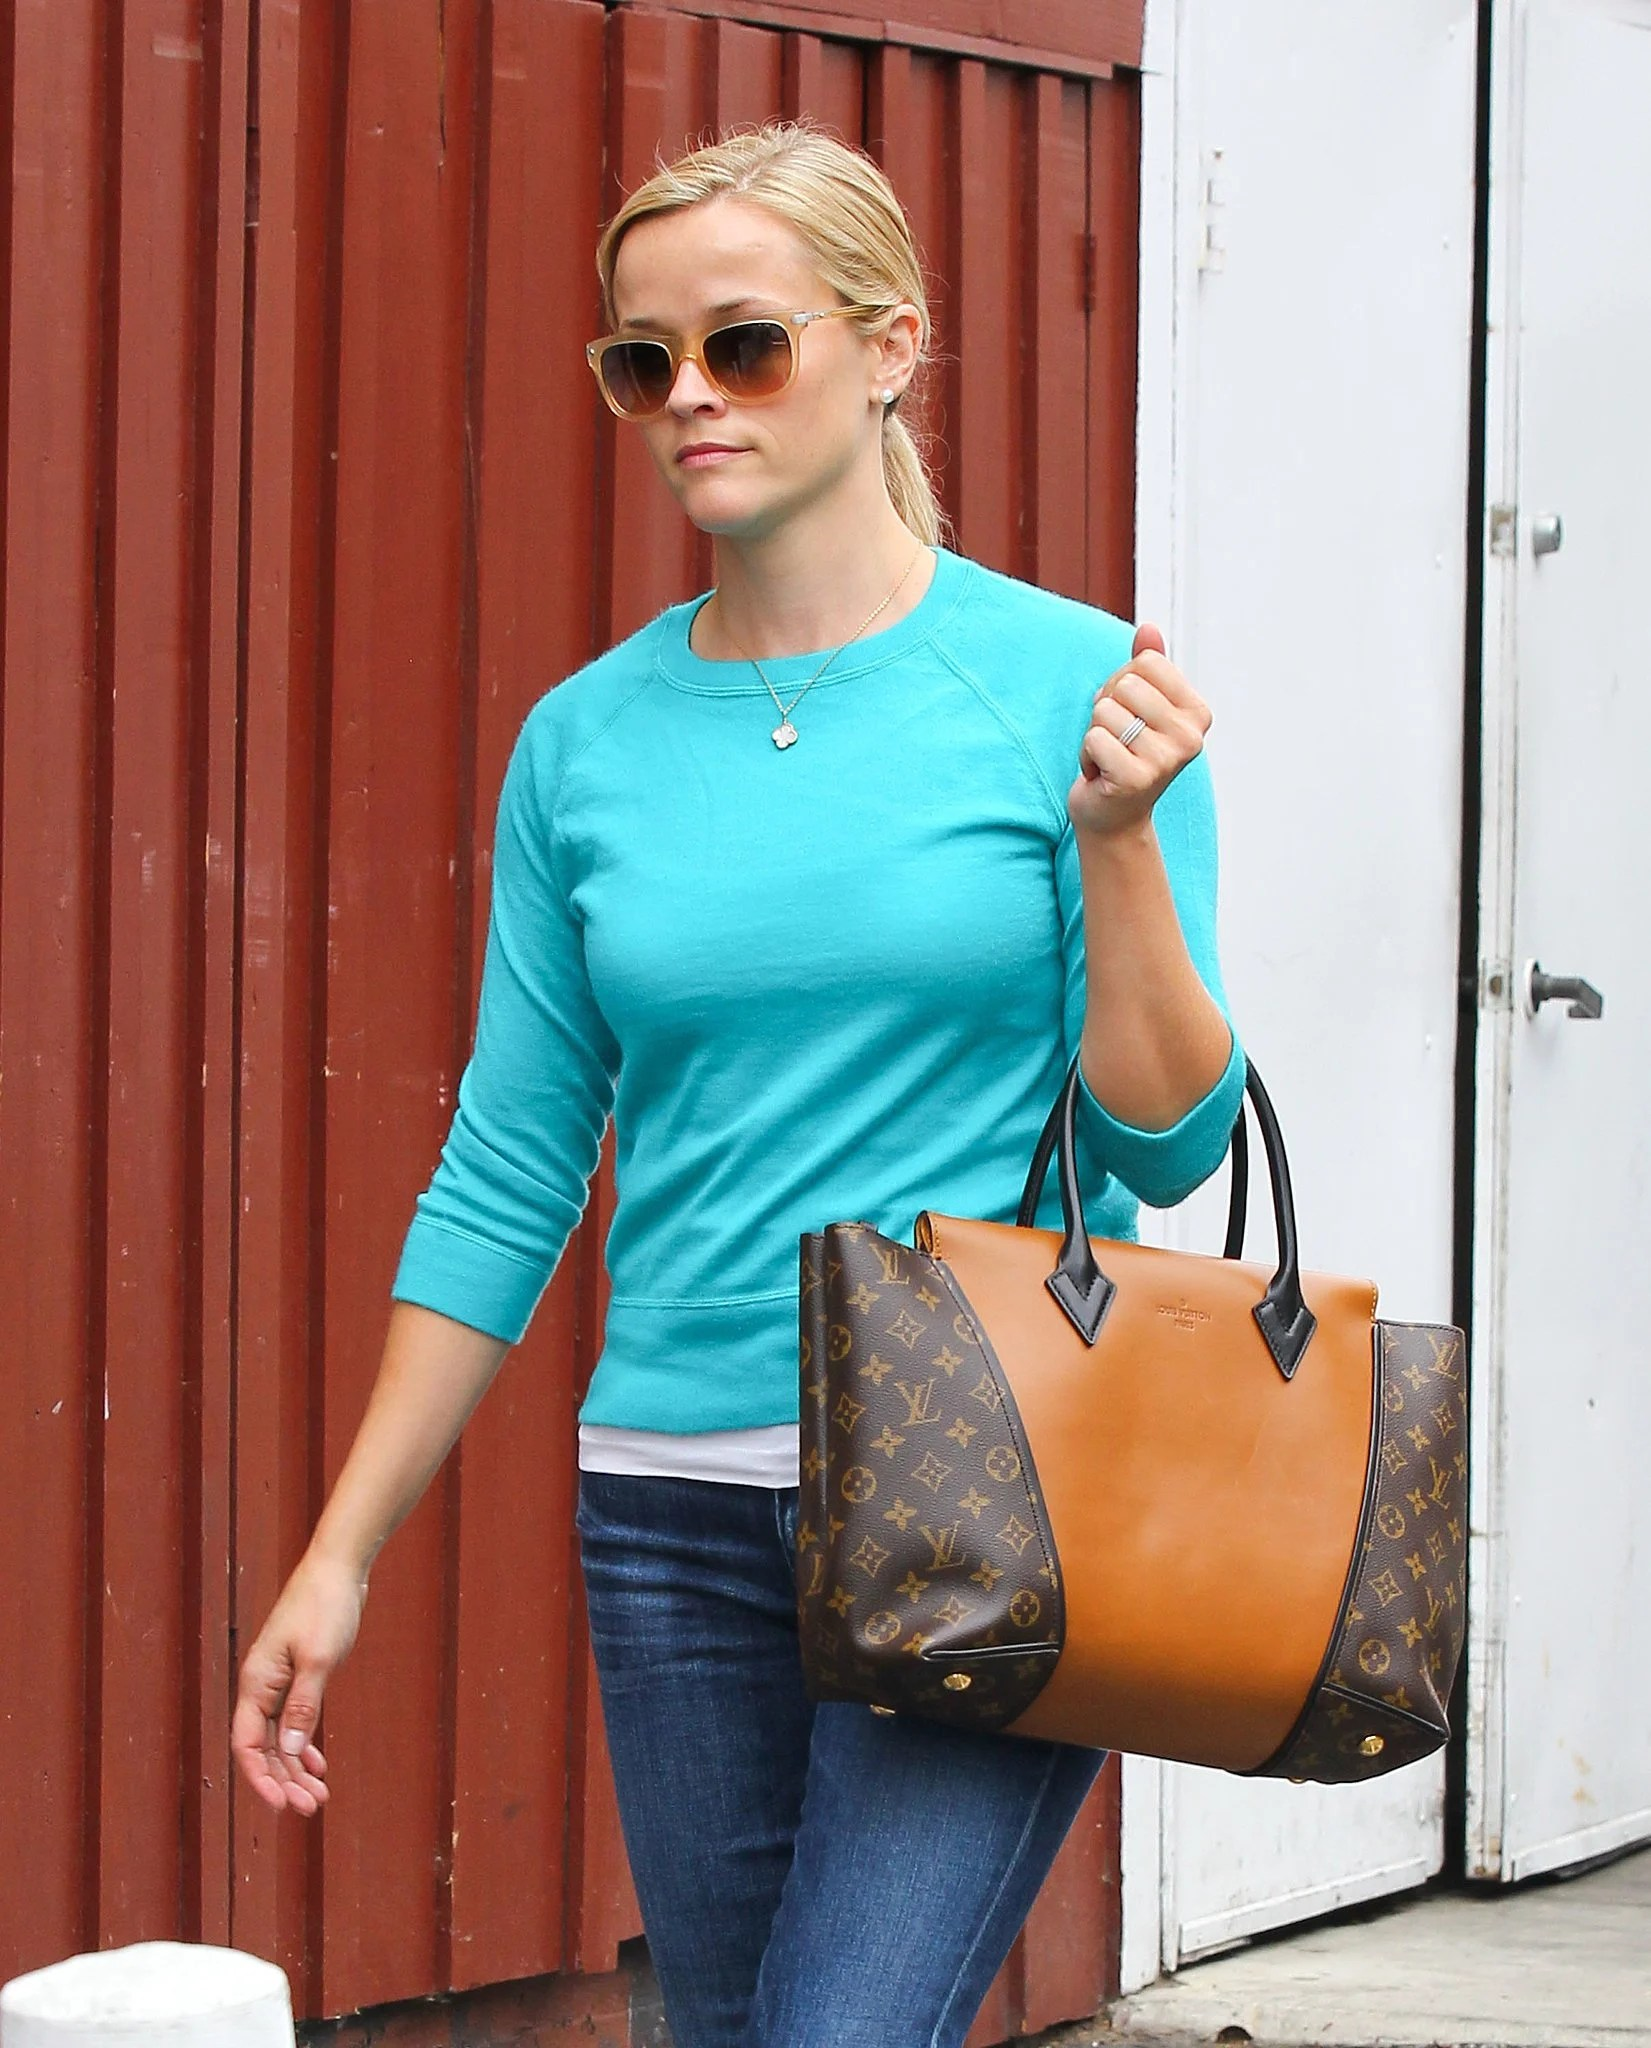 louis vuitton bags celebrities. reese-witherspoon-carried-louis-vuitton-bag louis vuitton bags celebrities p